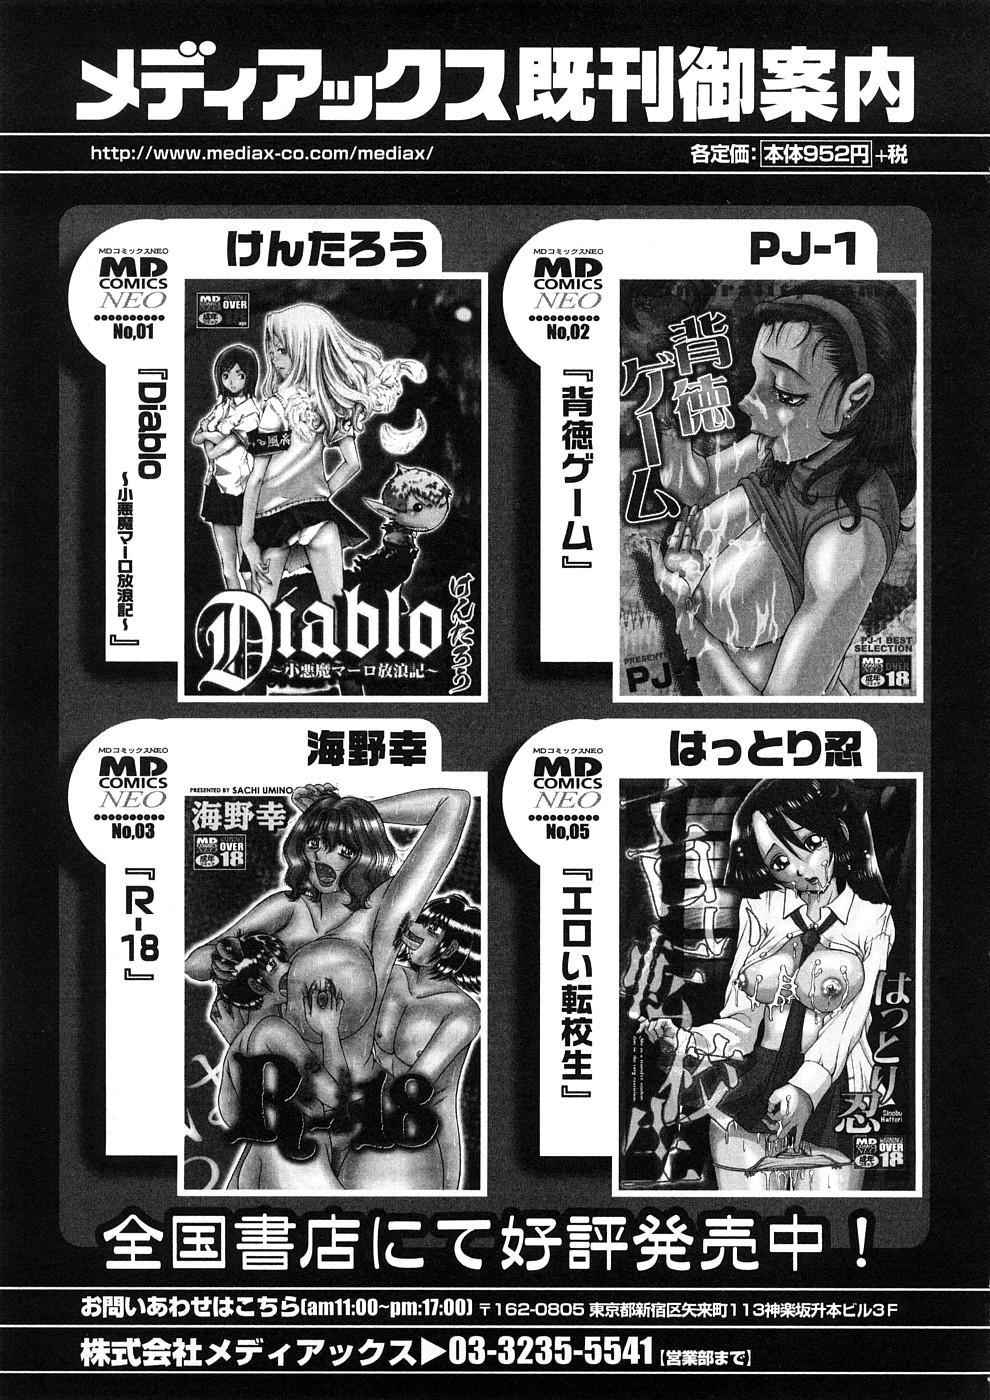 Geki Yaba Anthology Vol. 1 - Naka ni Dashite yo 237